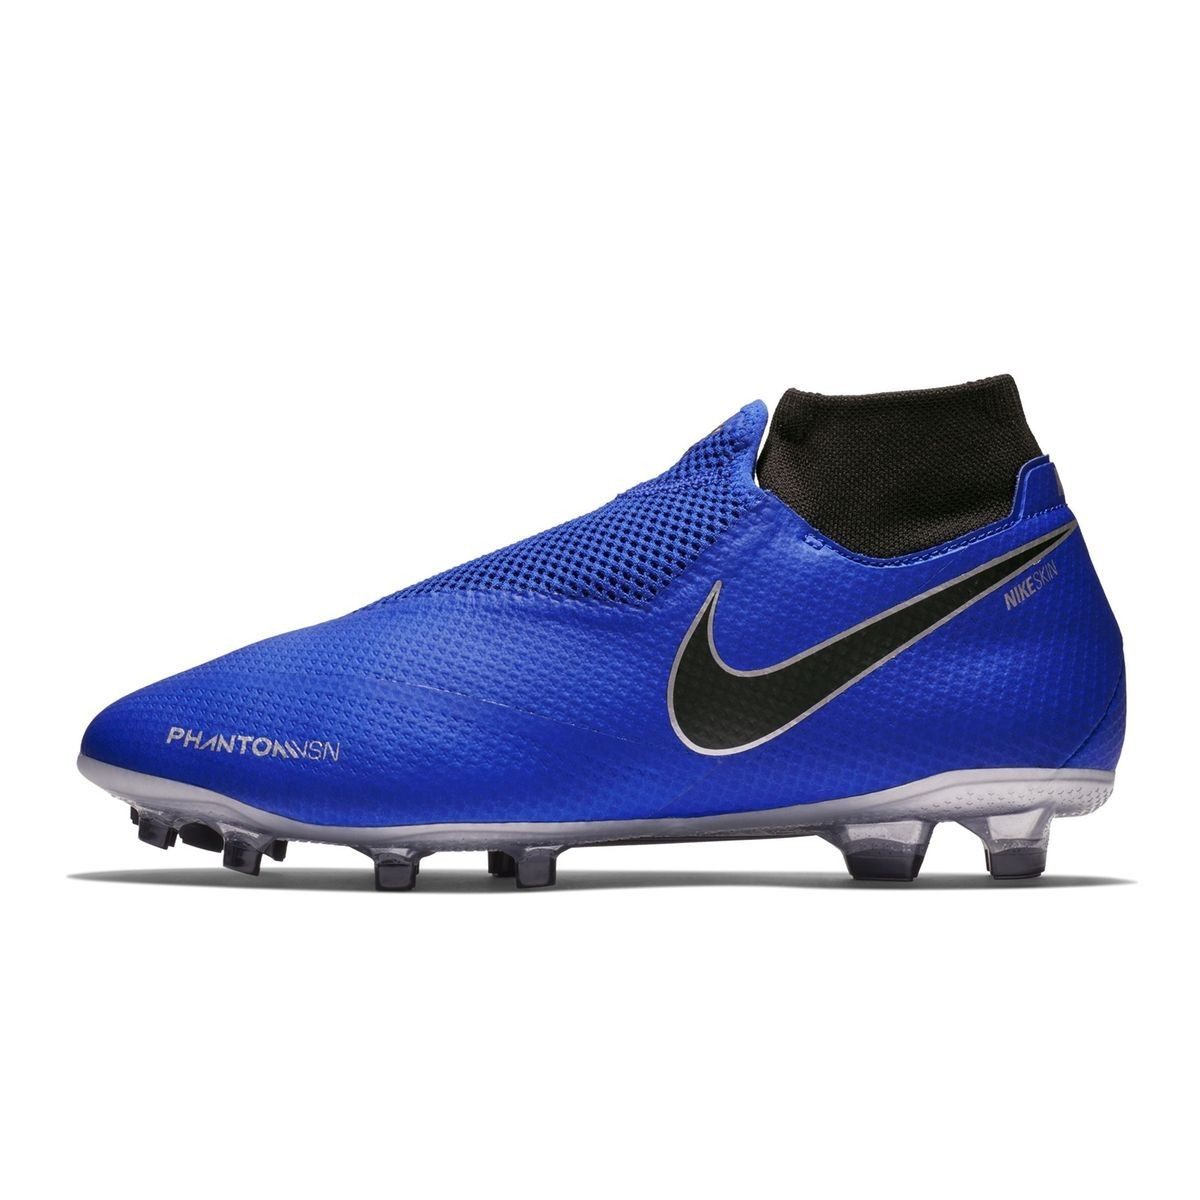 Chaussures Football Nike Phantom Vision Pro Df Fg Taille